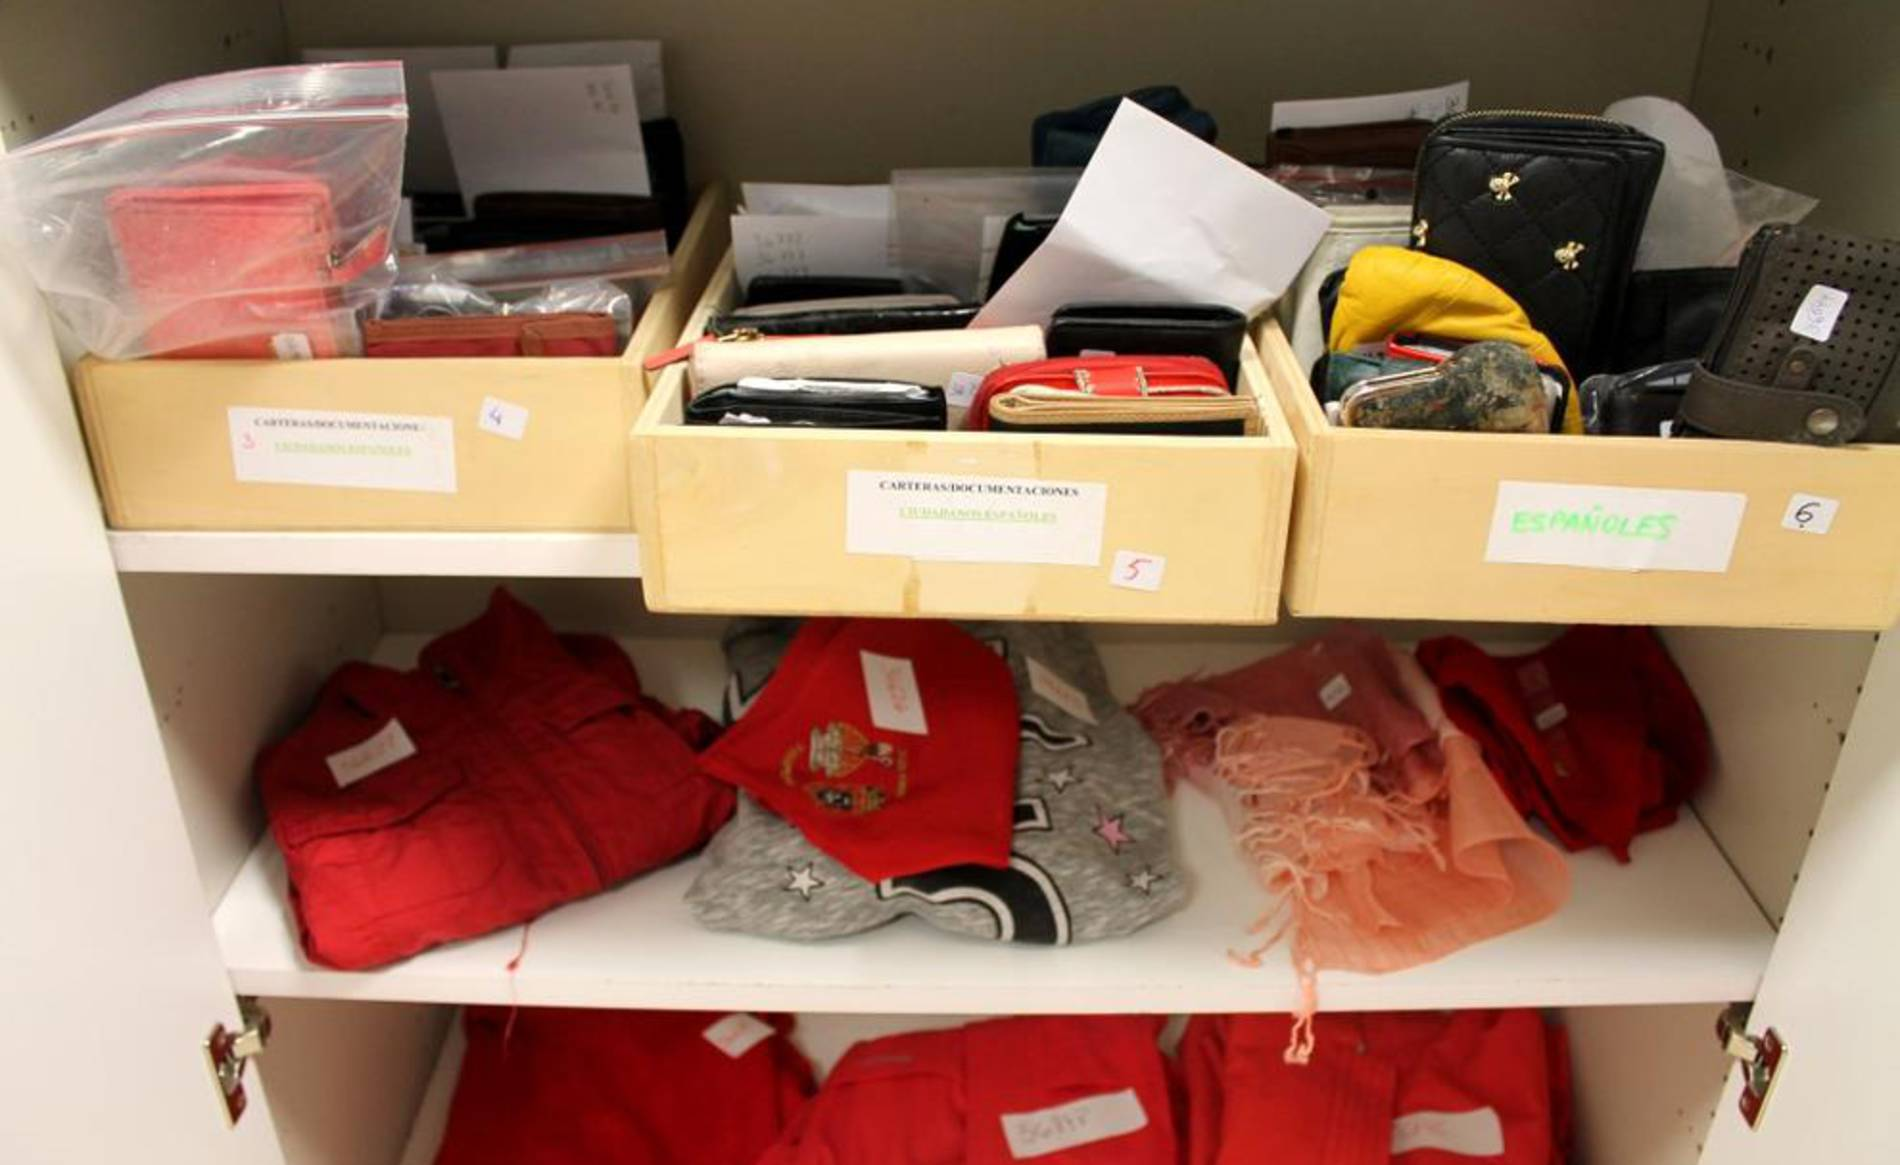 Oficina de objetos perdidos - Oficina de objetos perdidos ...